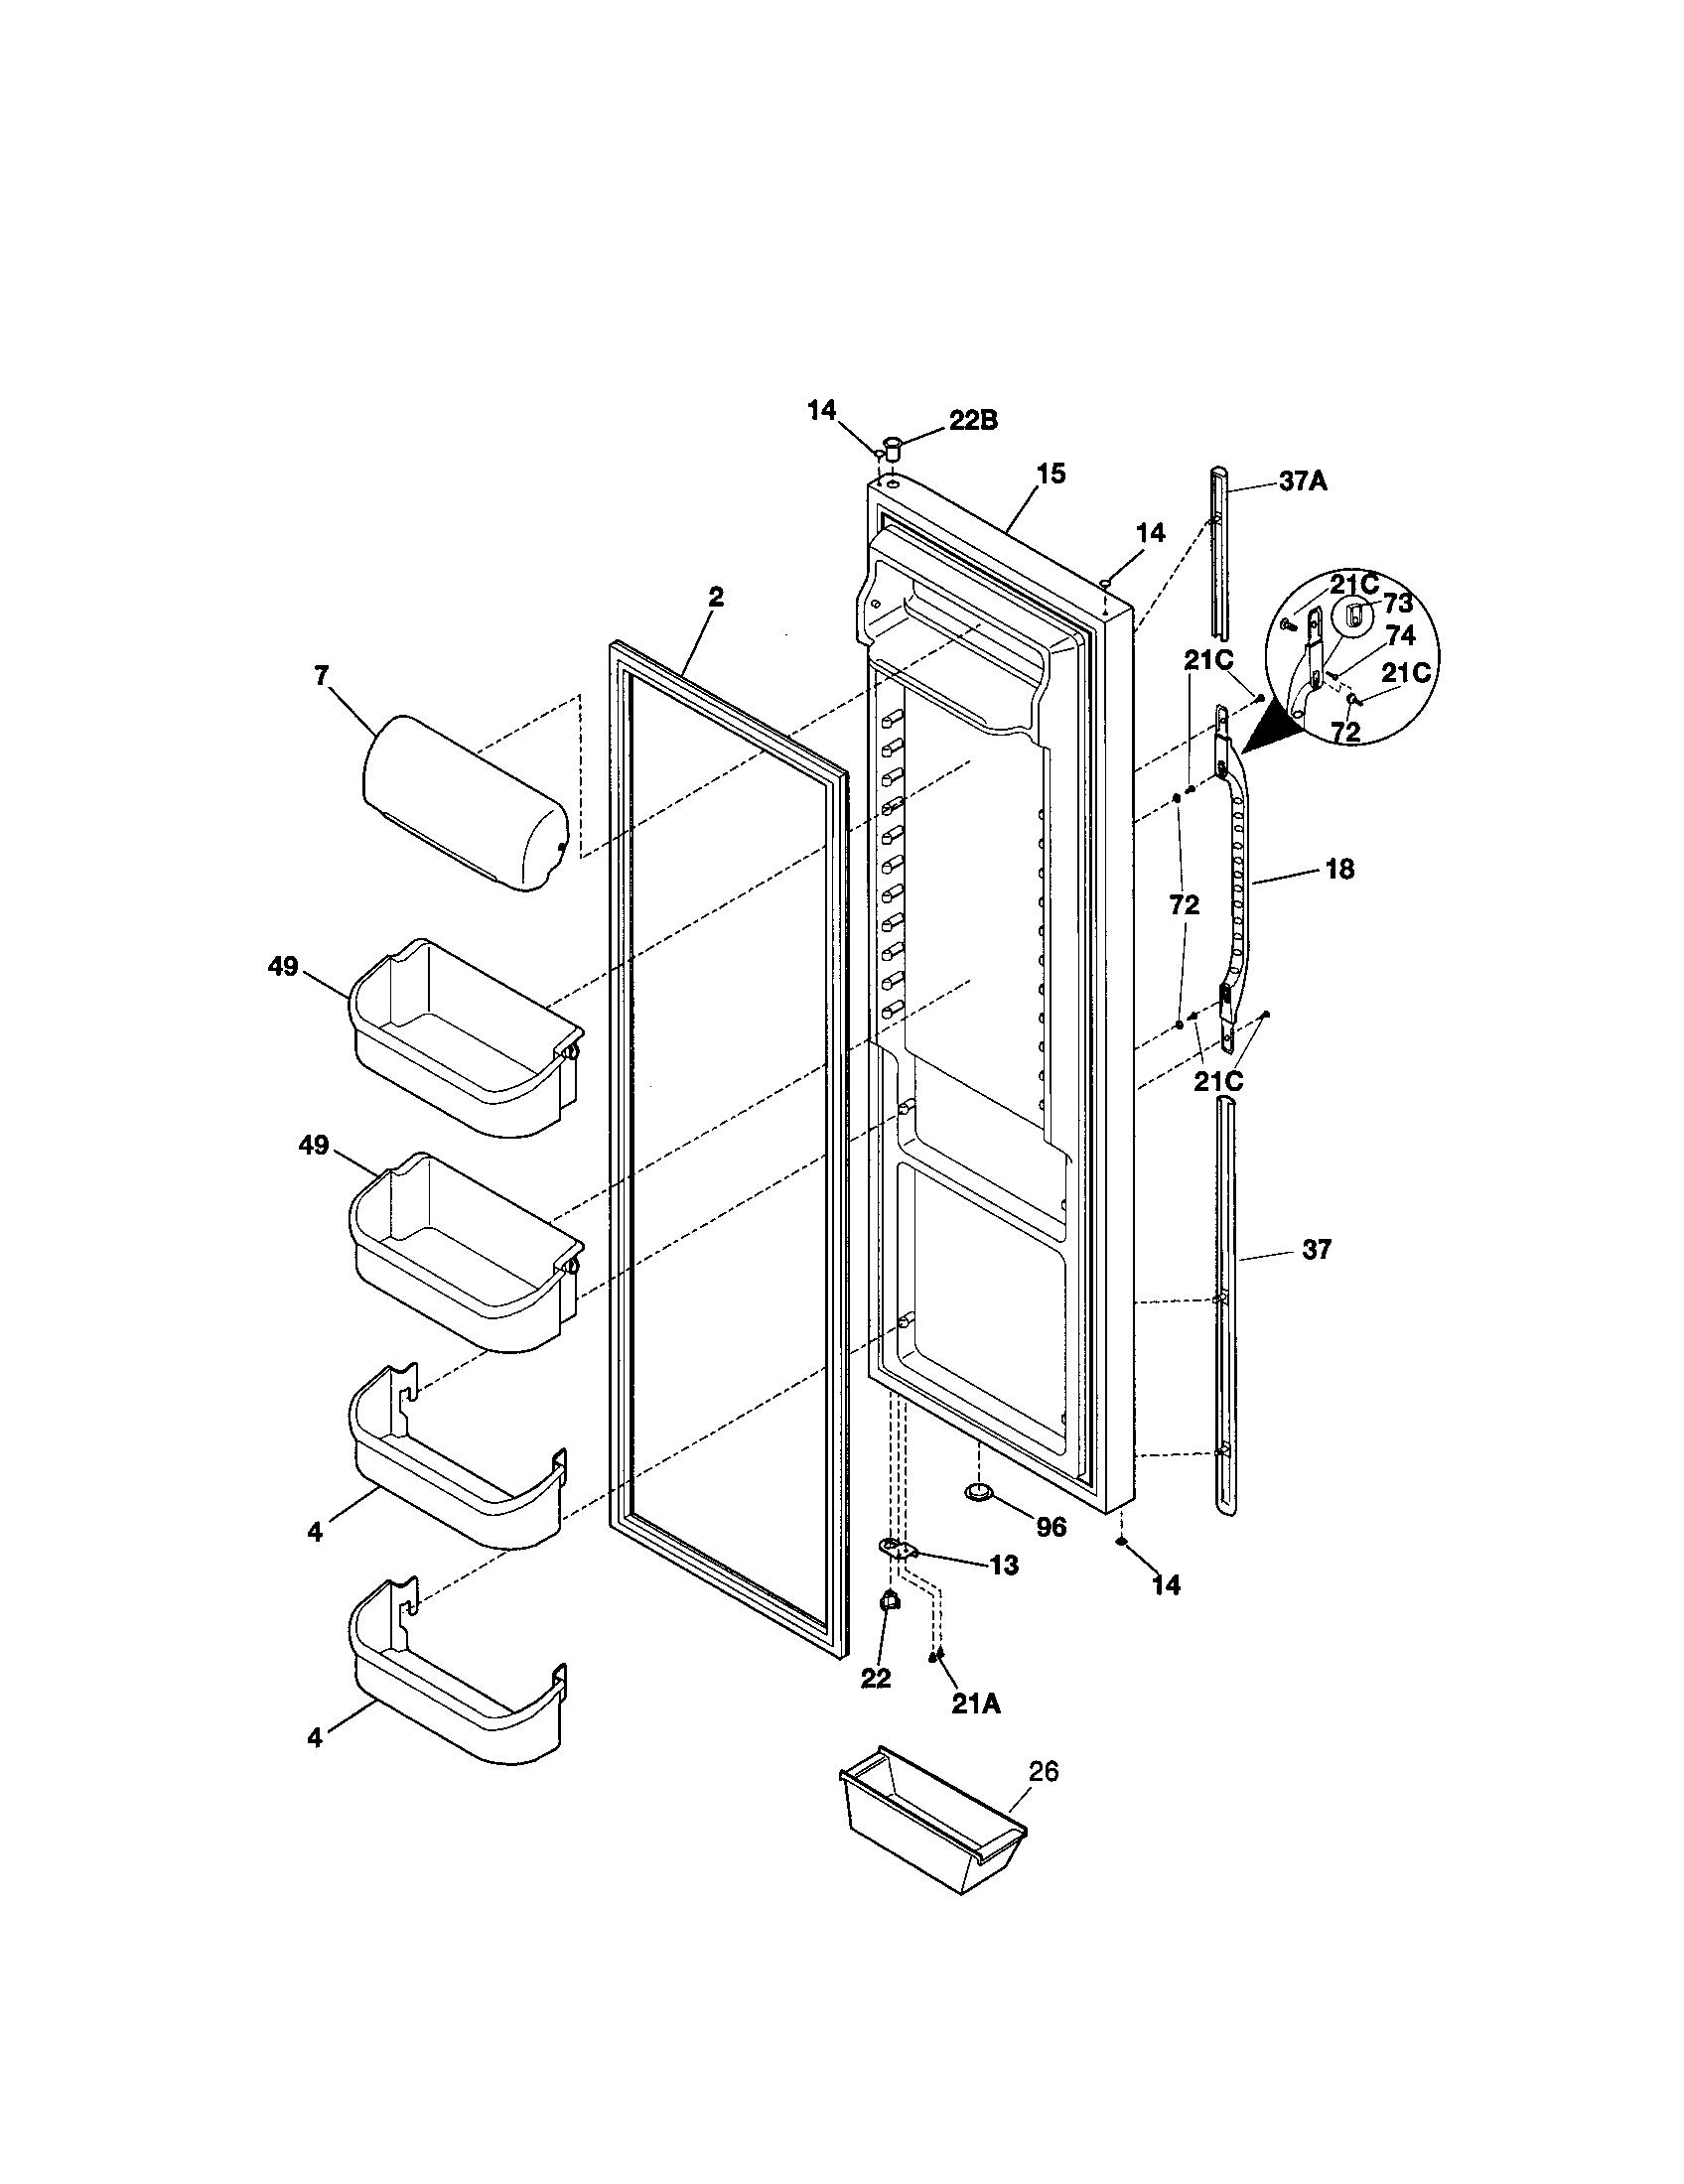 Kenmore model 25351692100 side-by-side refrigerator